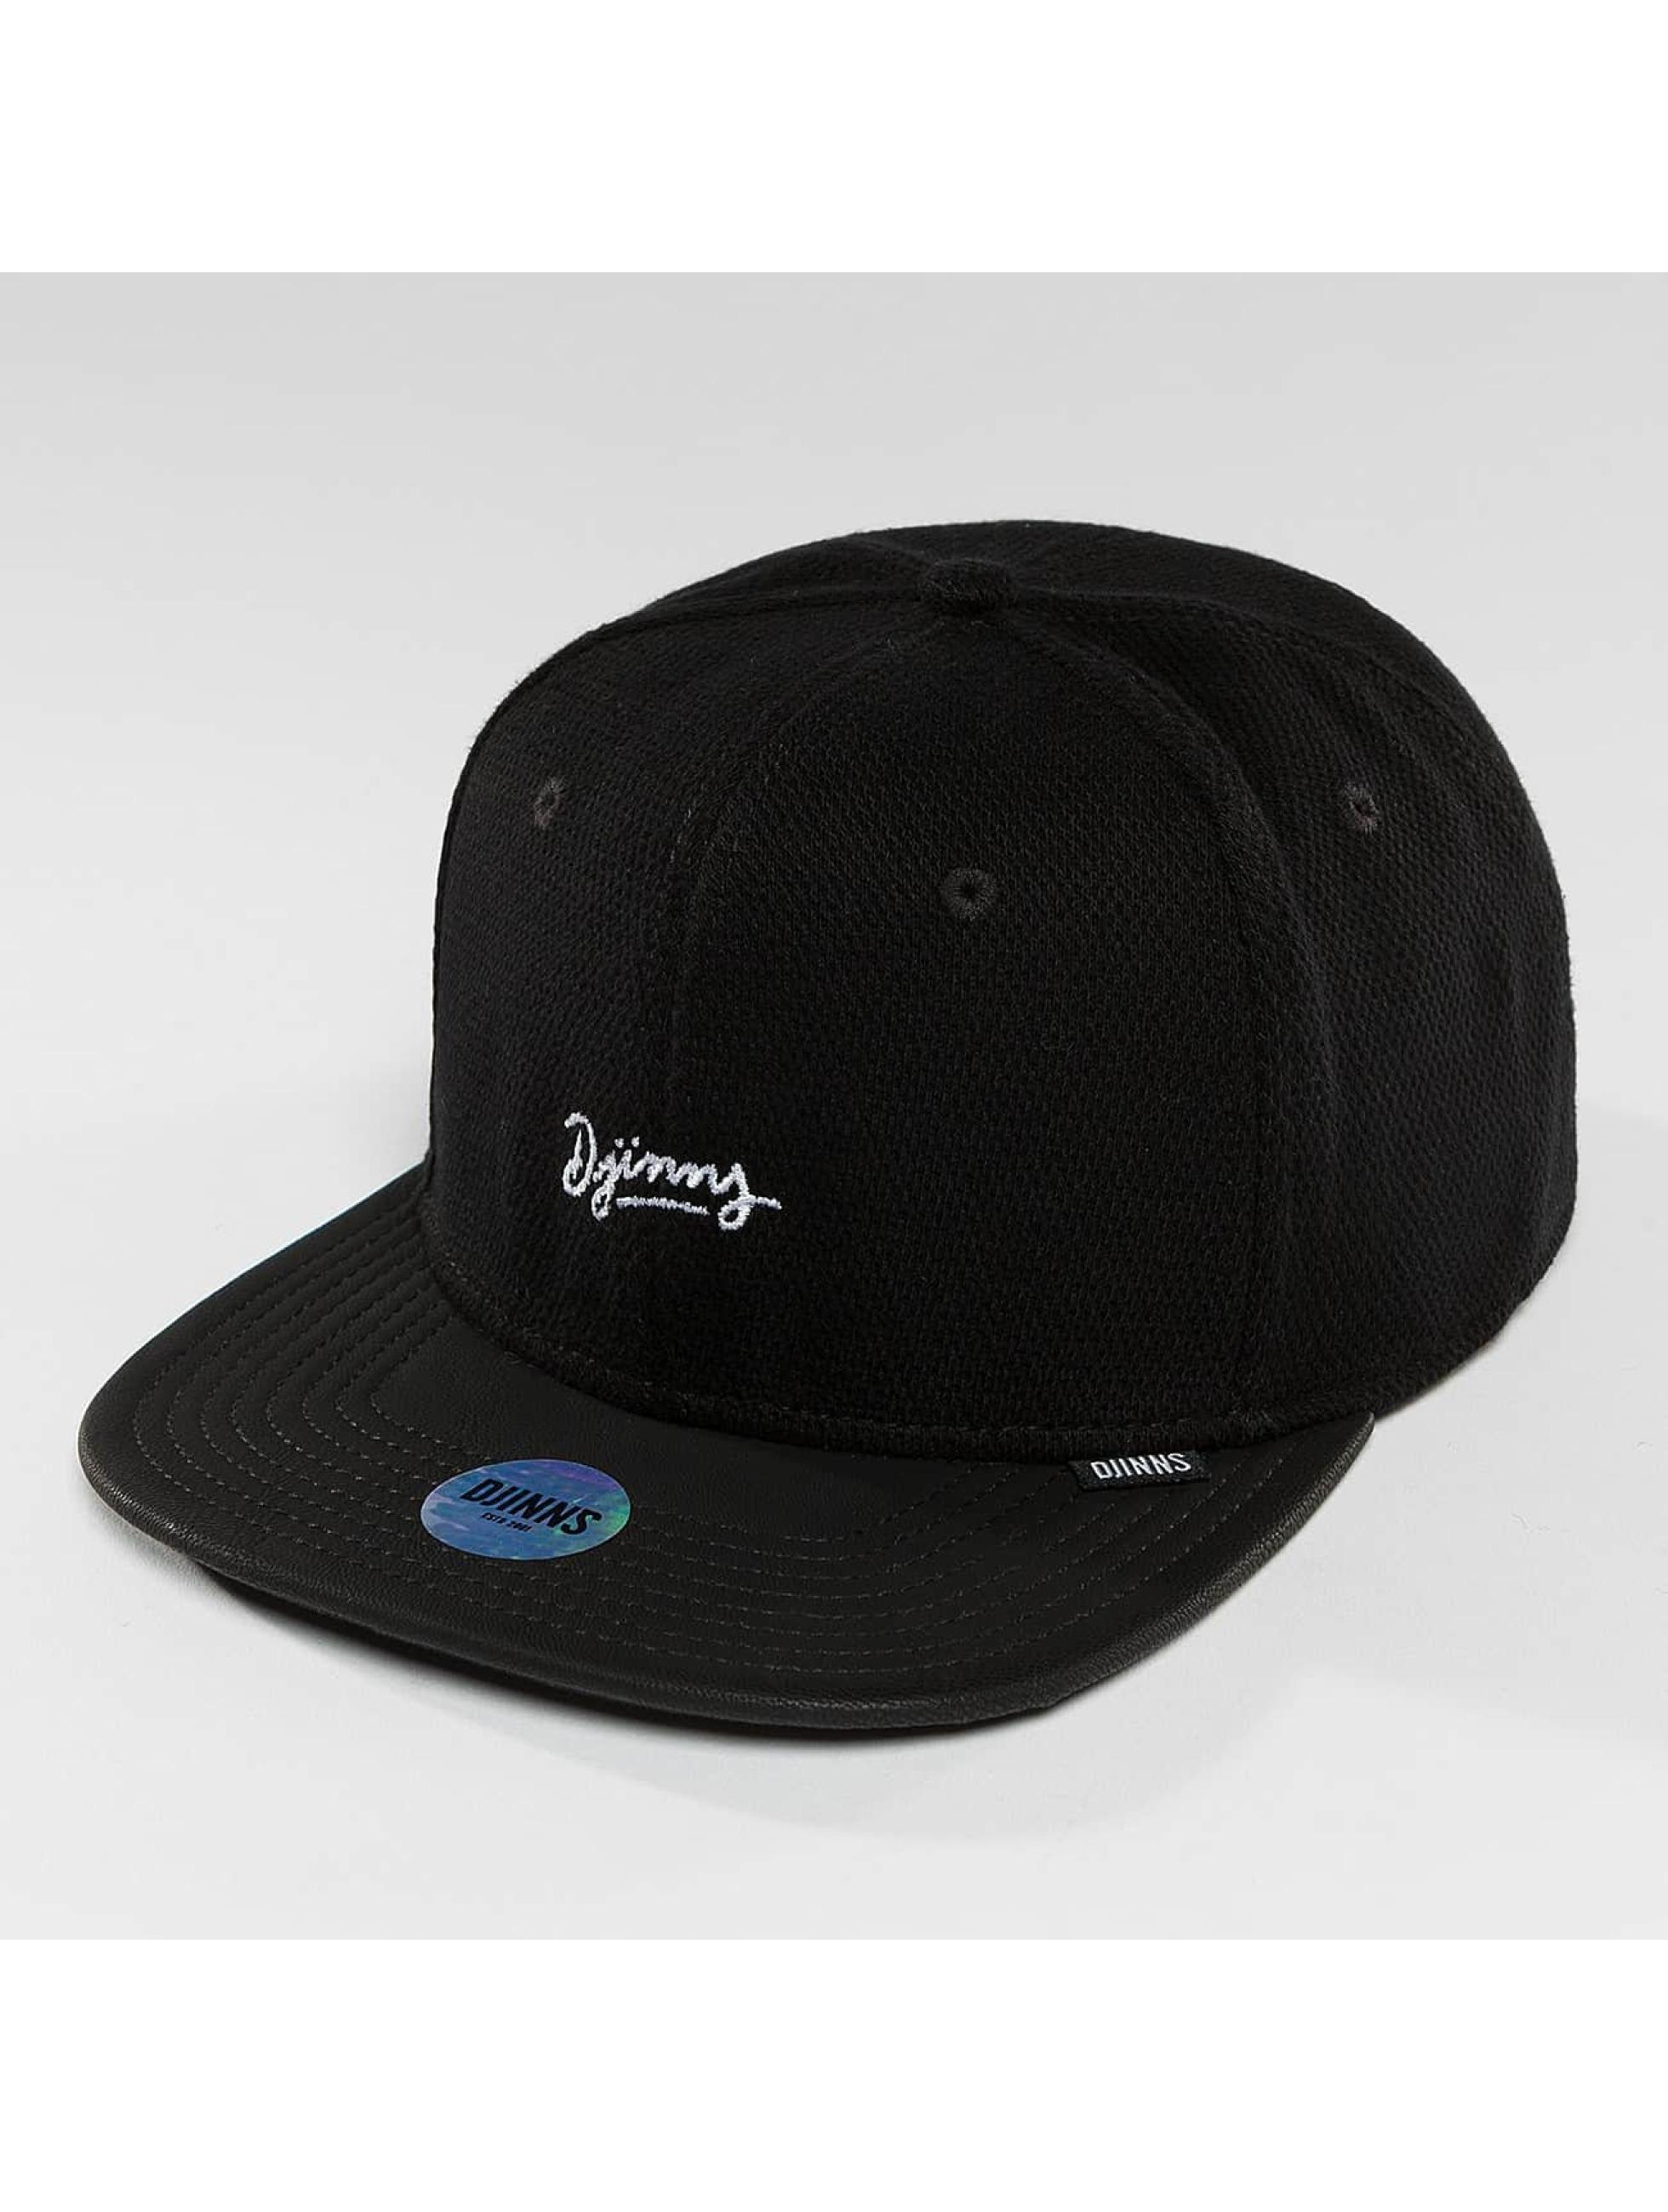 Djinns Snapback Caps 6 Panel Piki Leather musta